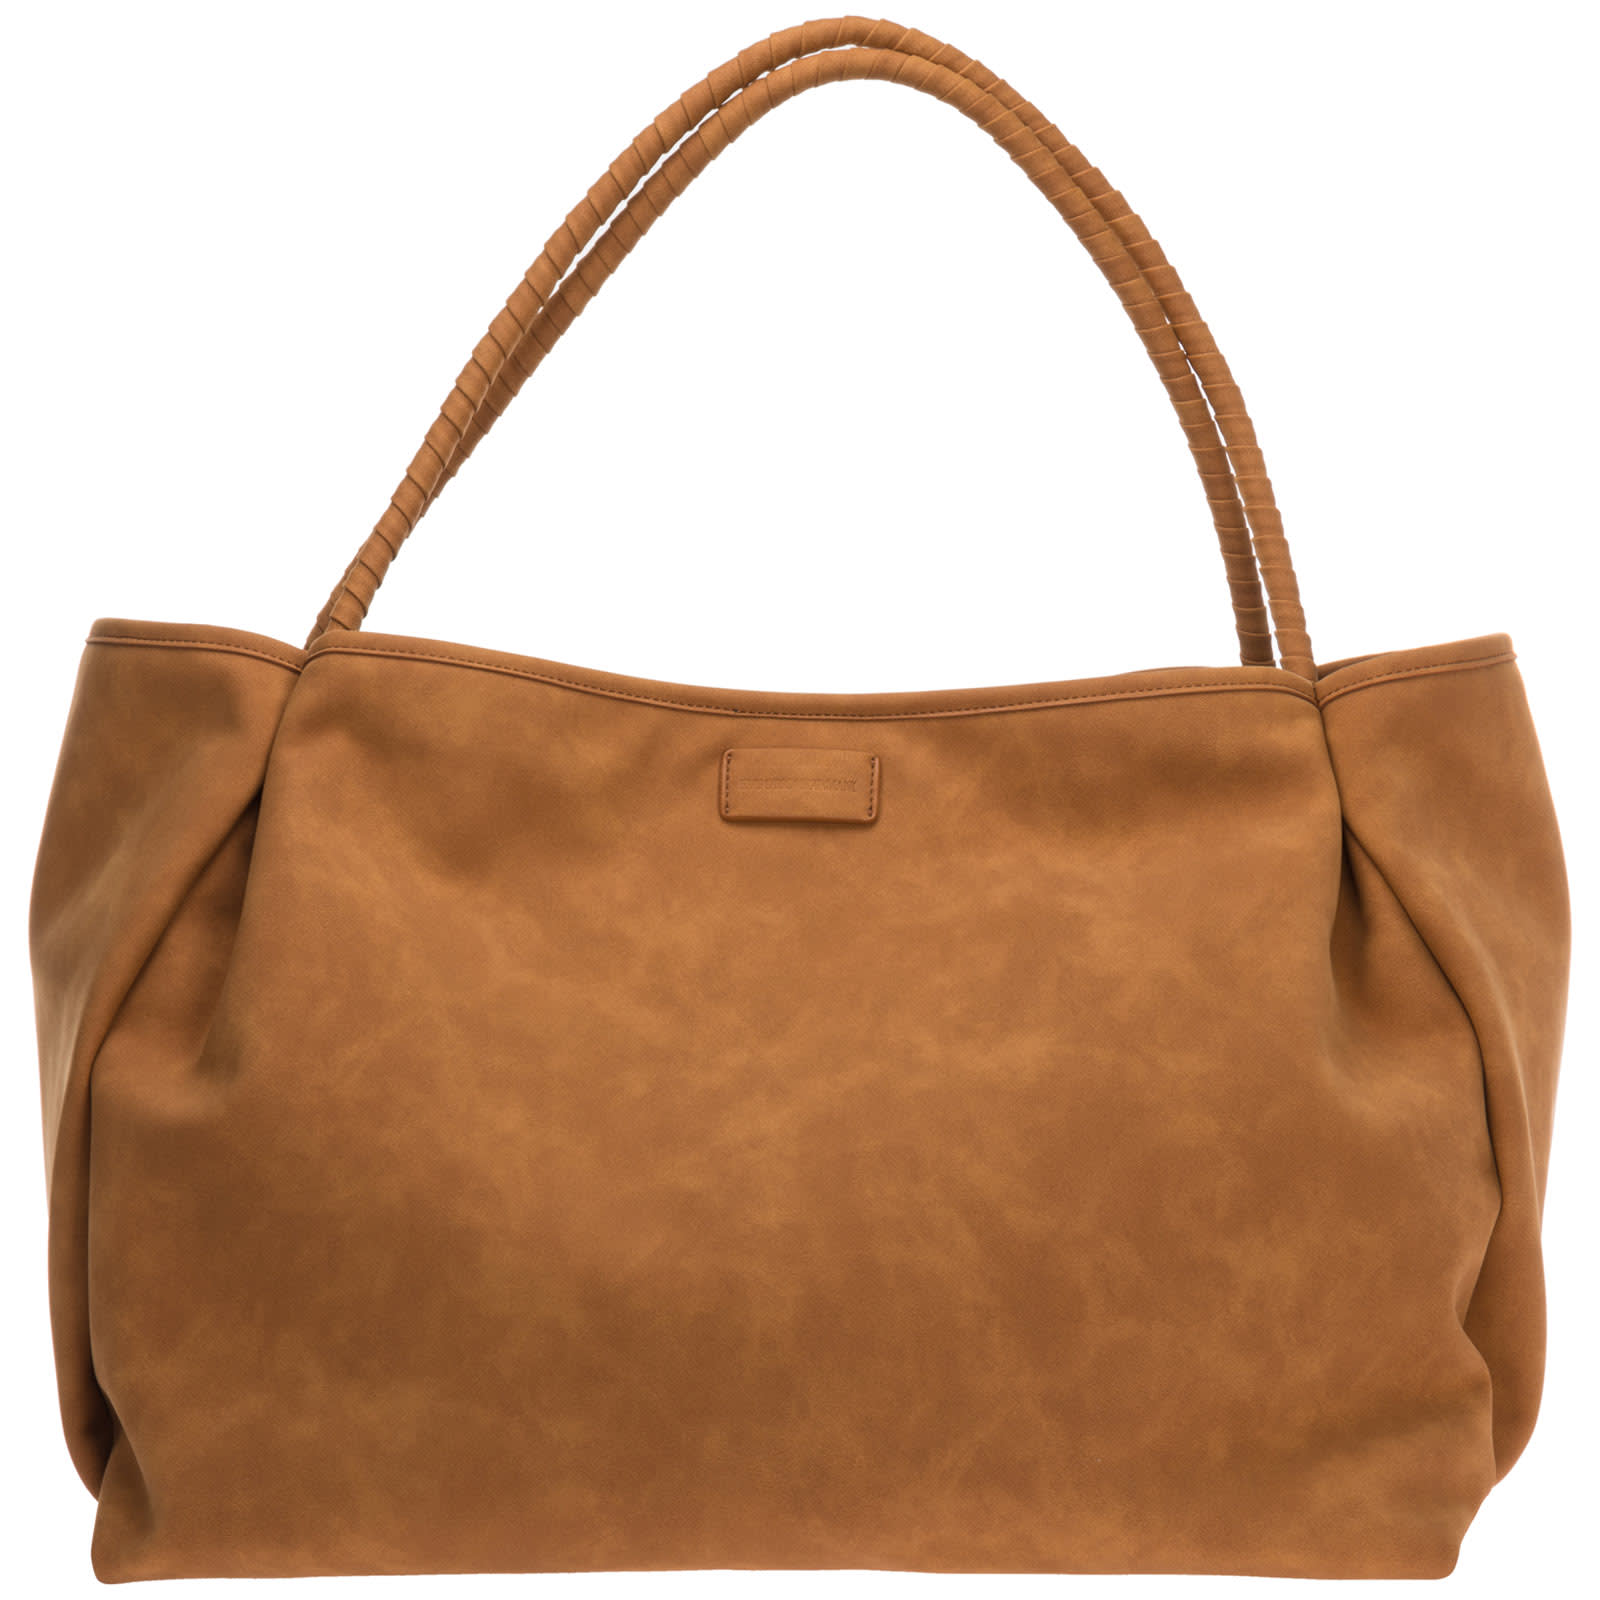 Emporio Armani Myea Handbags